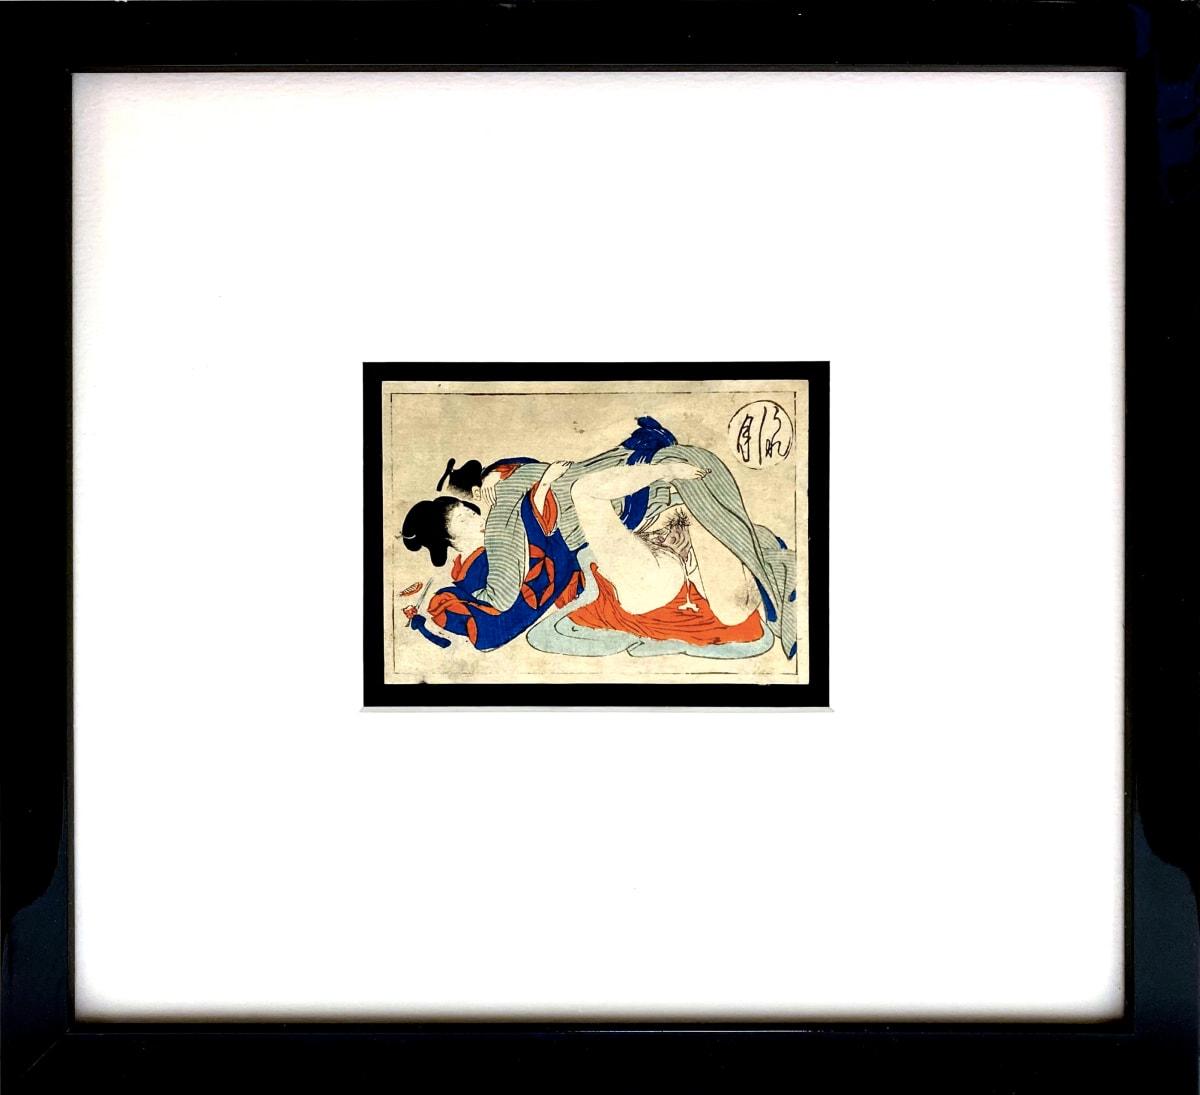 3951 - Shunga -- Spring Pictures  #3 by Meiji Era 1868-1912